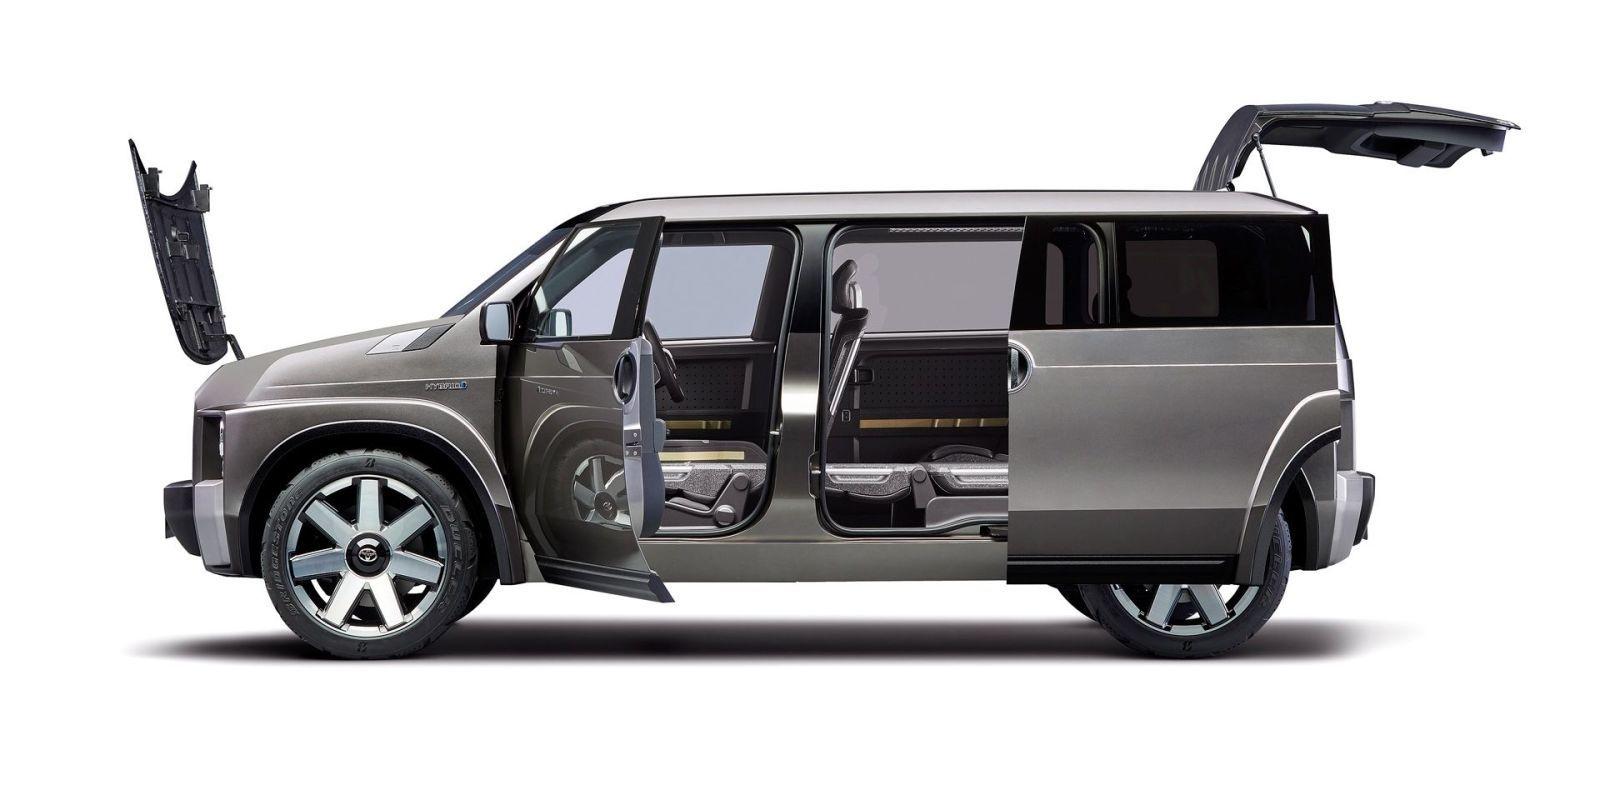 Toyota Just Made the Most Badass Minivan